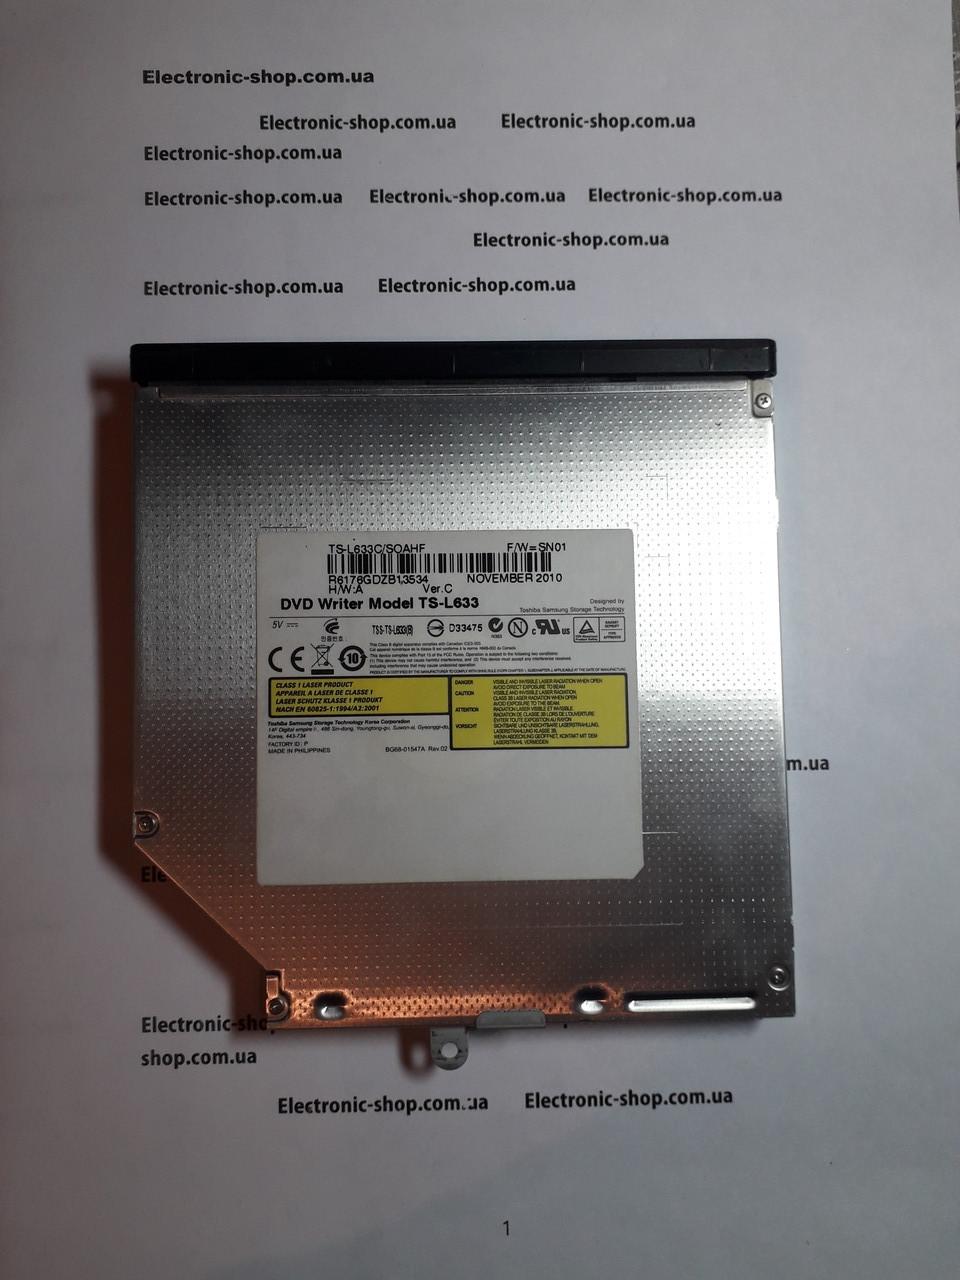 DVD привод   Sony  PCG - 61315L  TS-L633   оригинал б.у